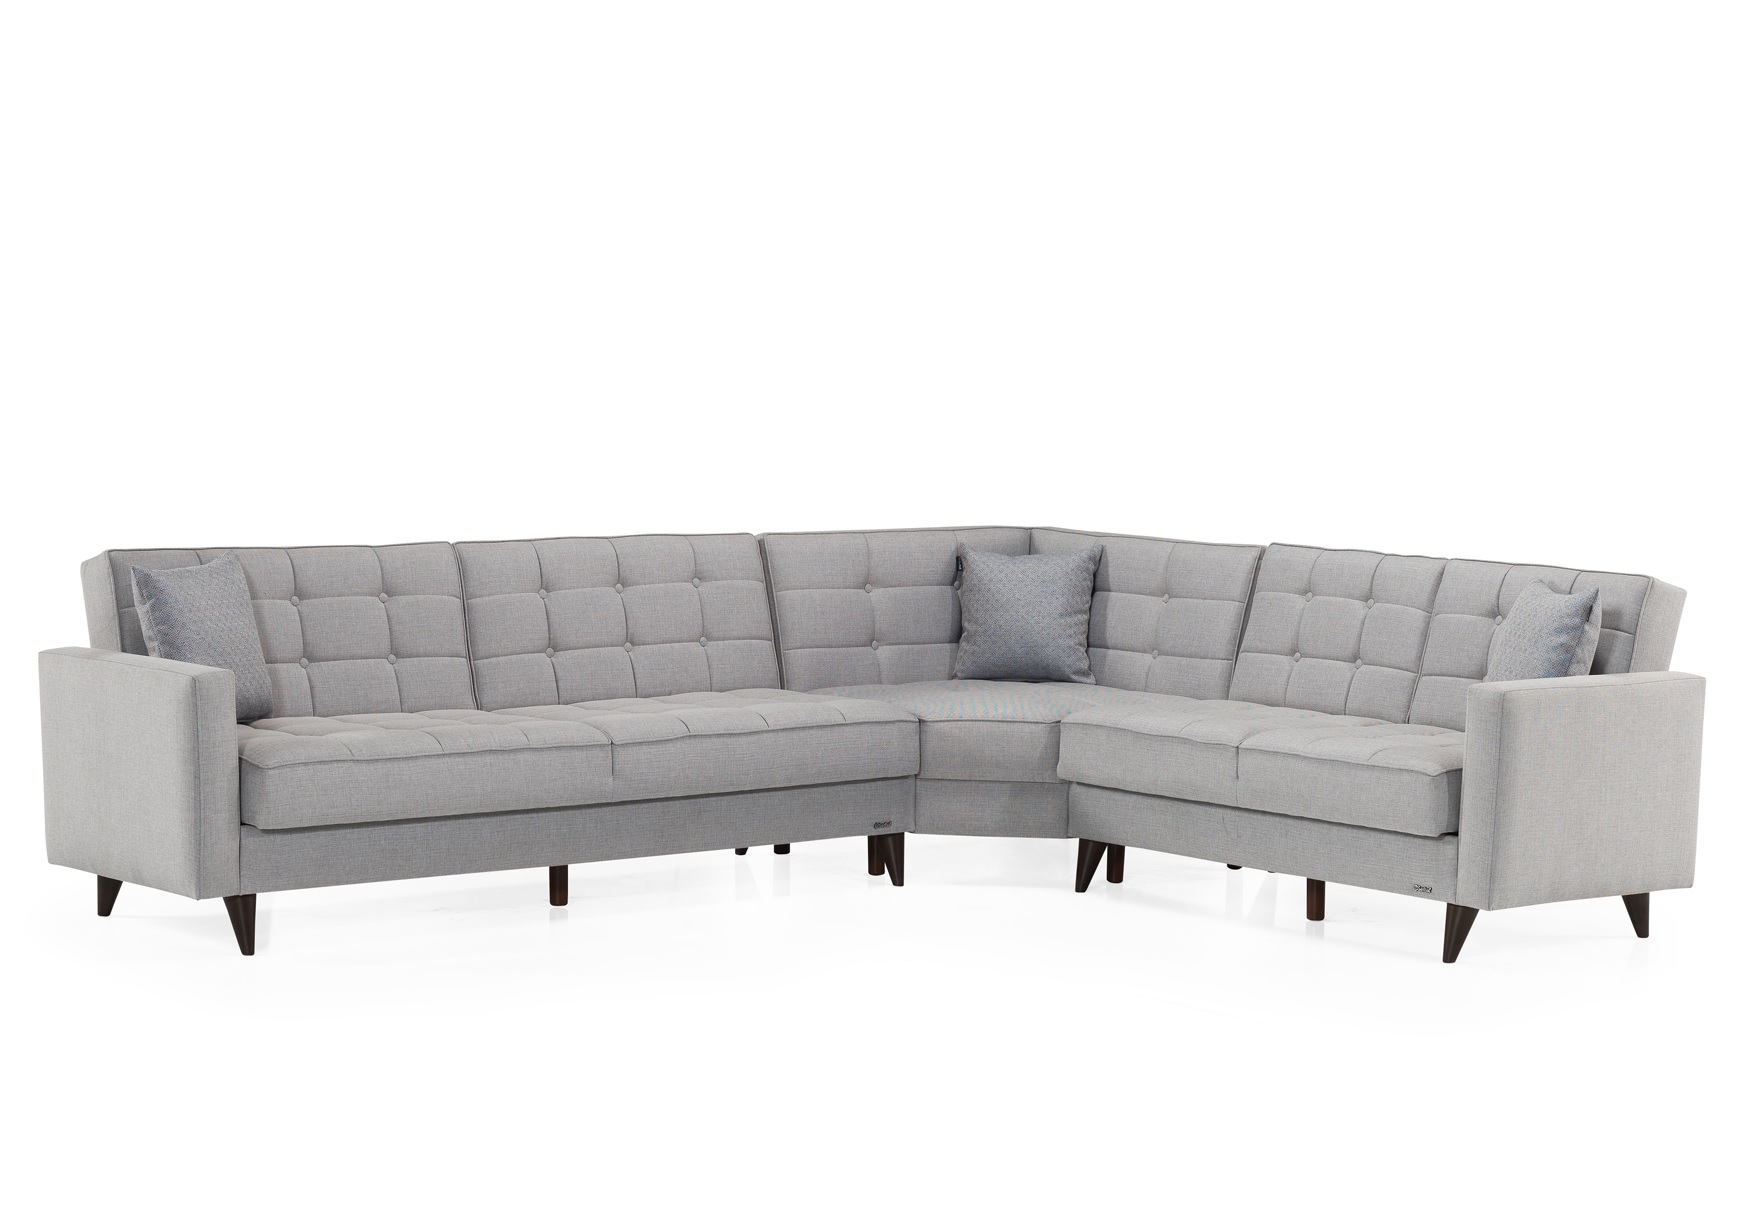 Canapé angle lit-coffre gris ORLANDO